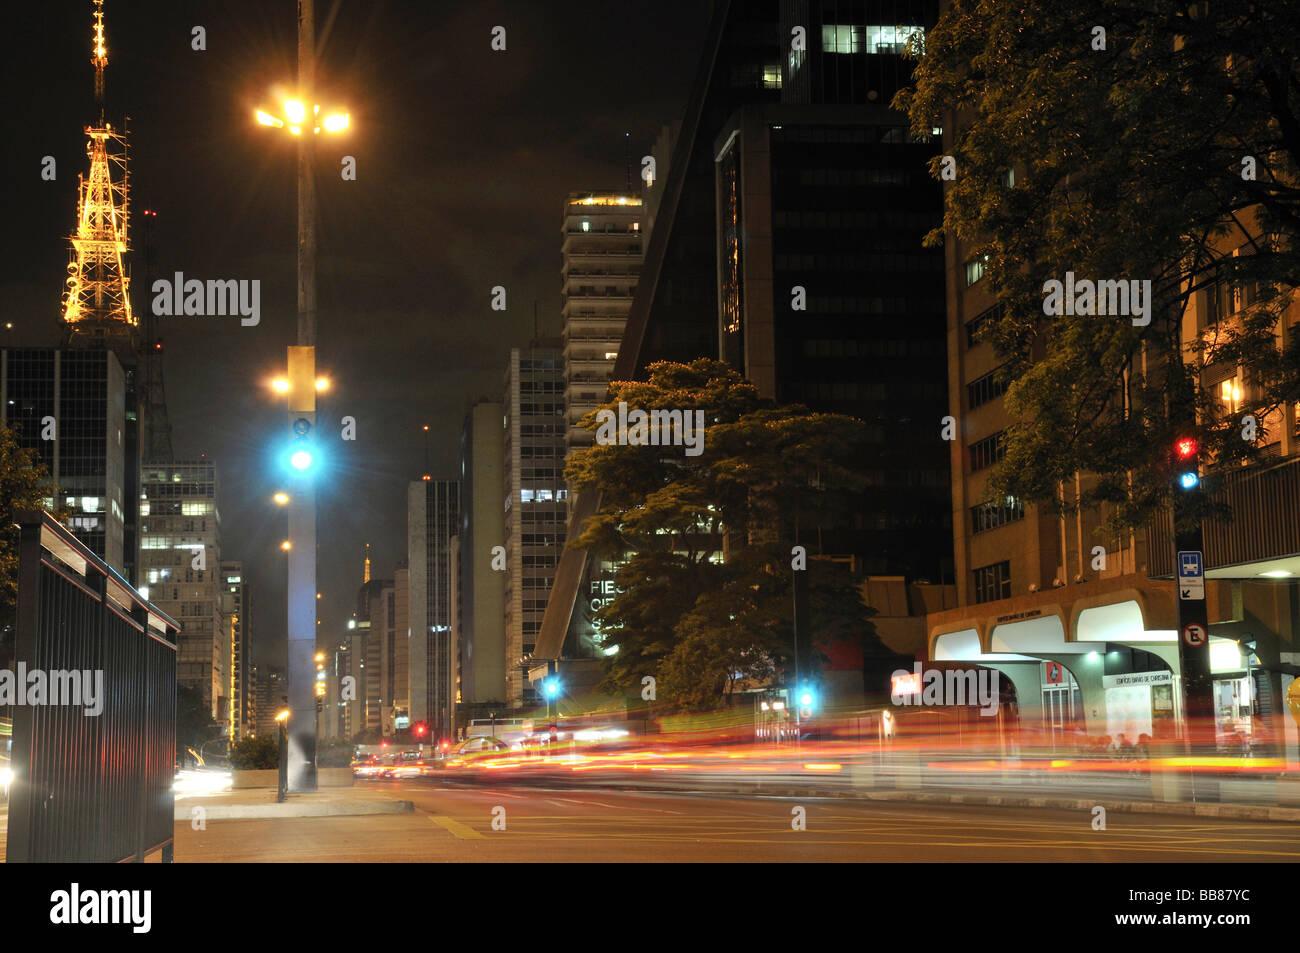 Traffic in the Avenida Paulista street by night, Sao Paulo, Brazil, South America - Stock Image